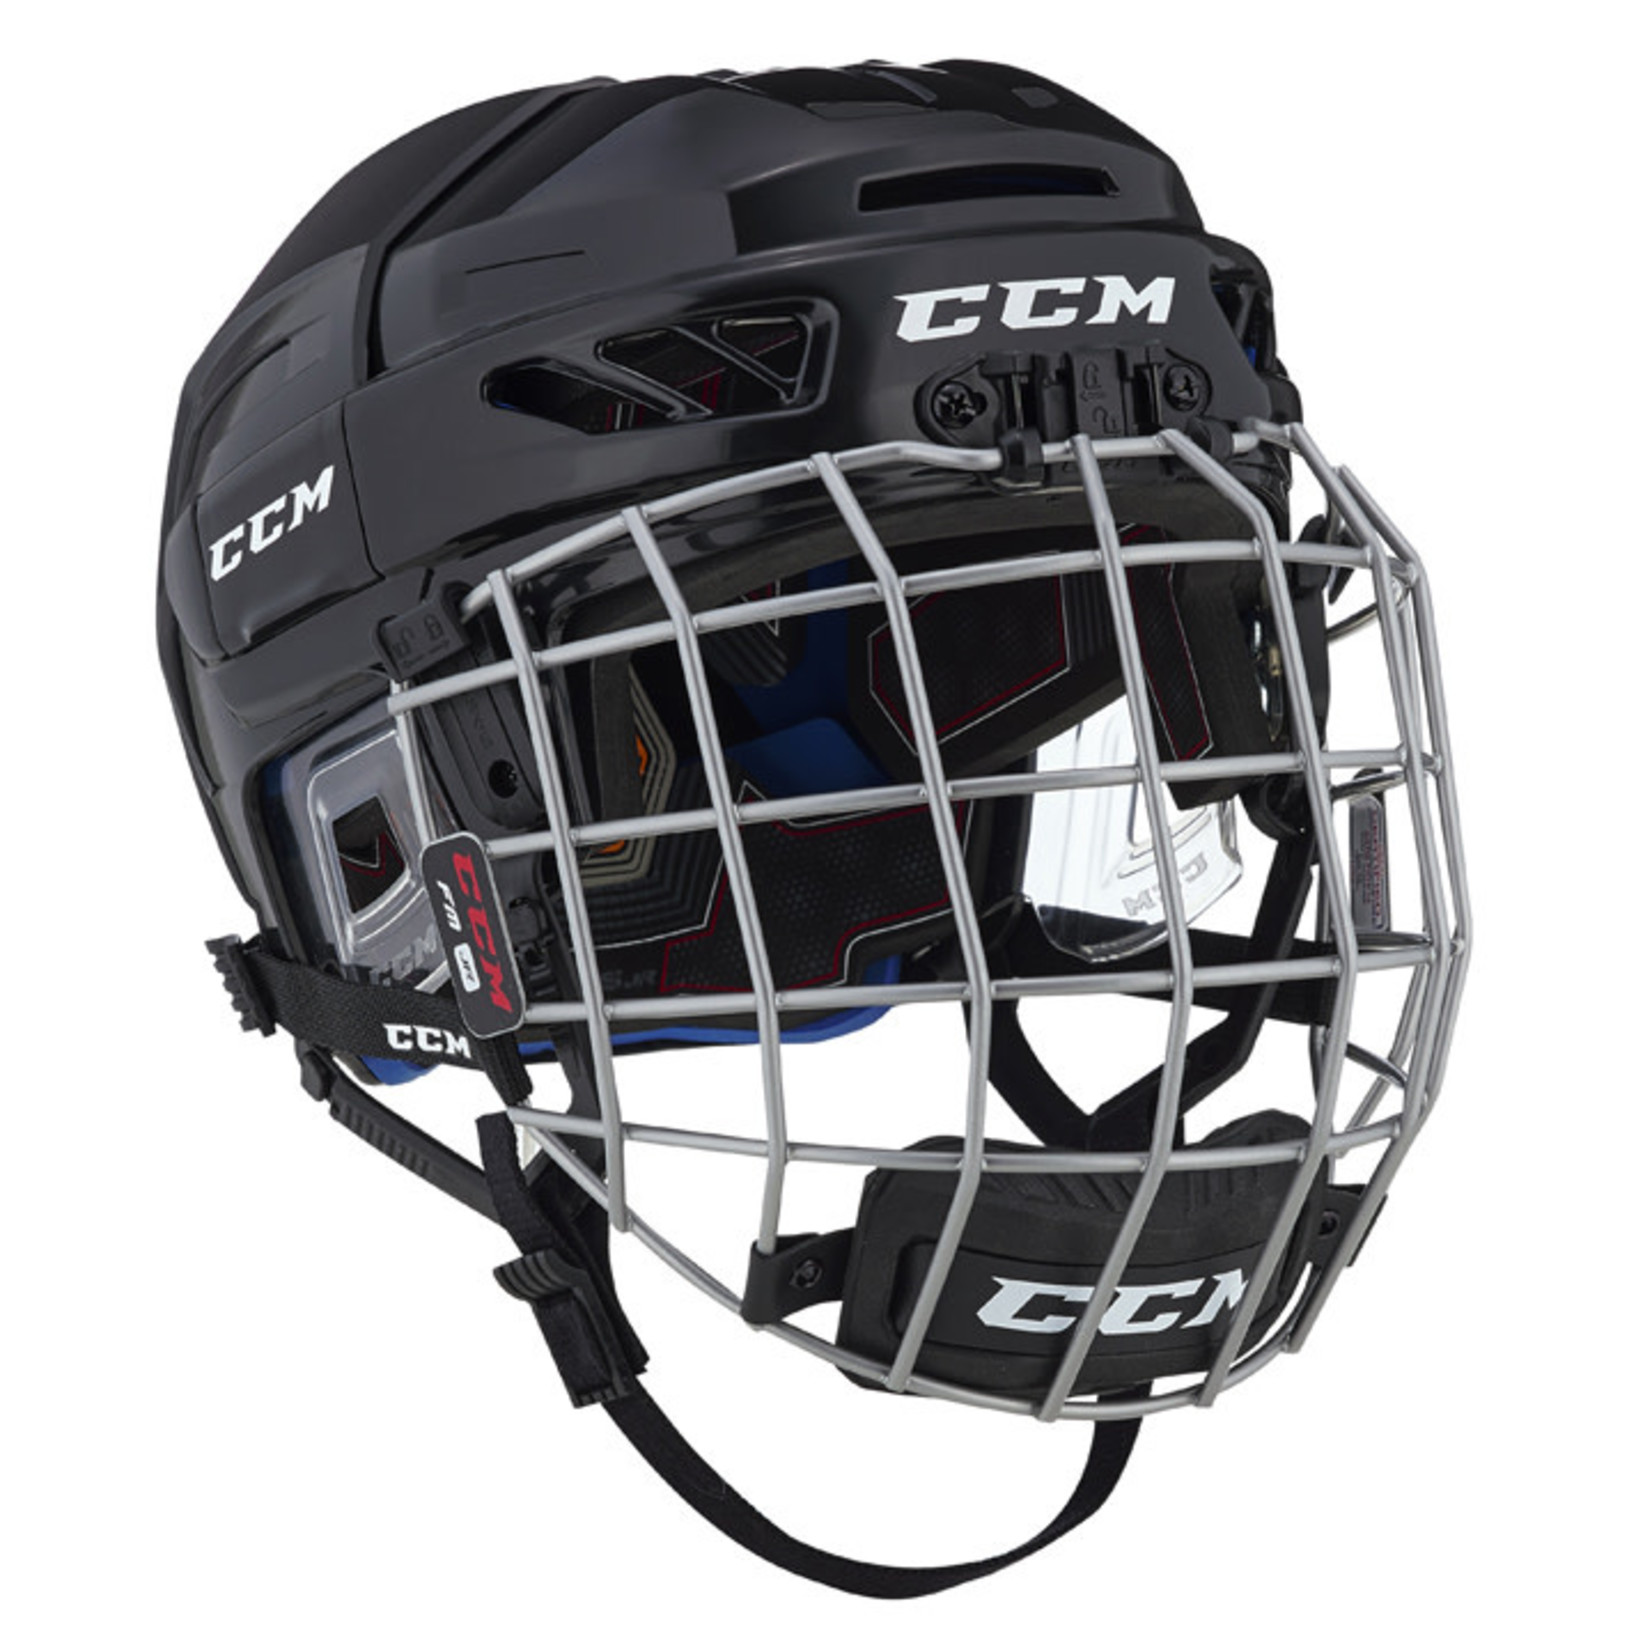 CCM CCM Hockey Helmet Combo, FL3DS, Junior